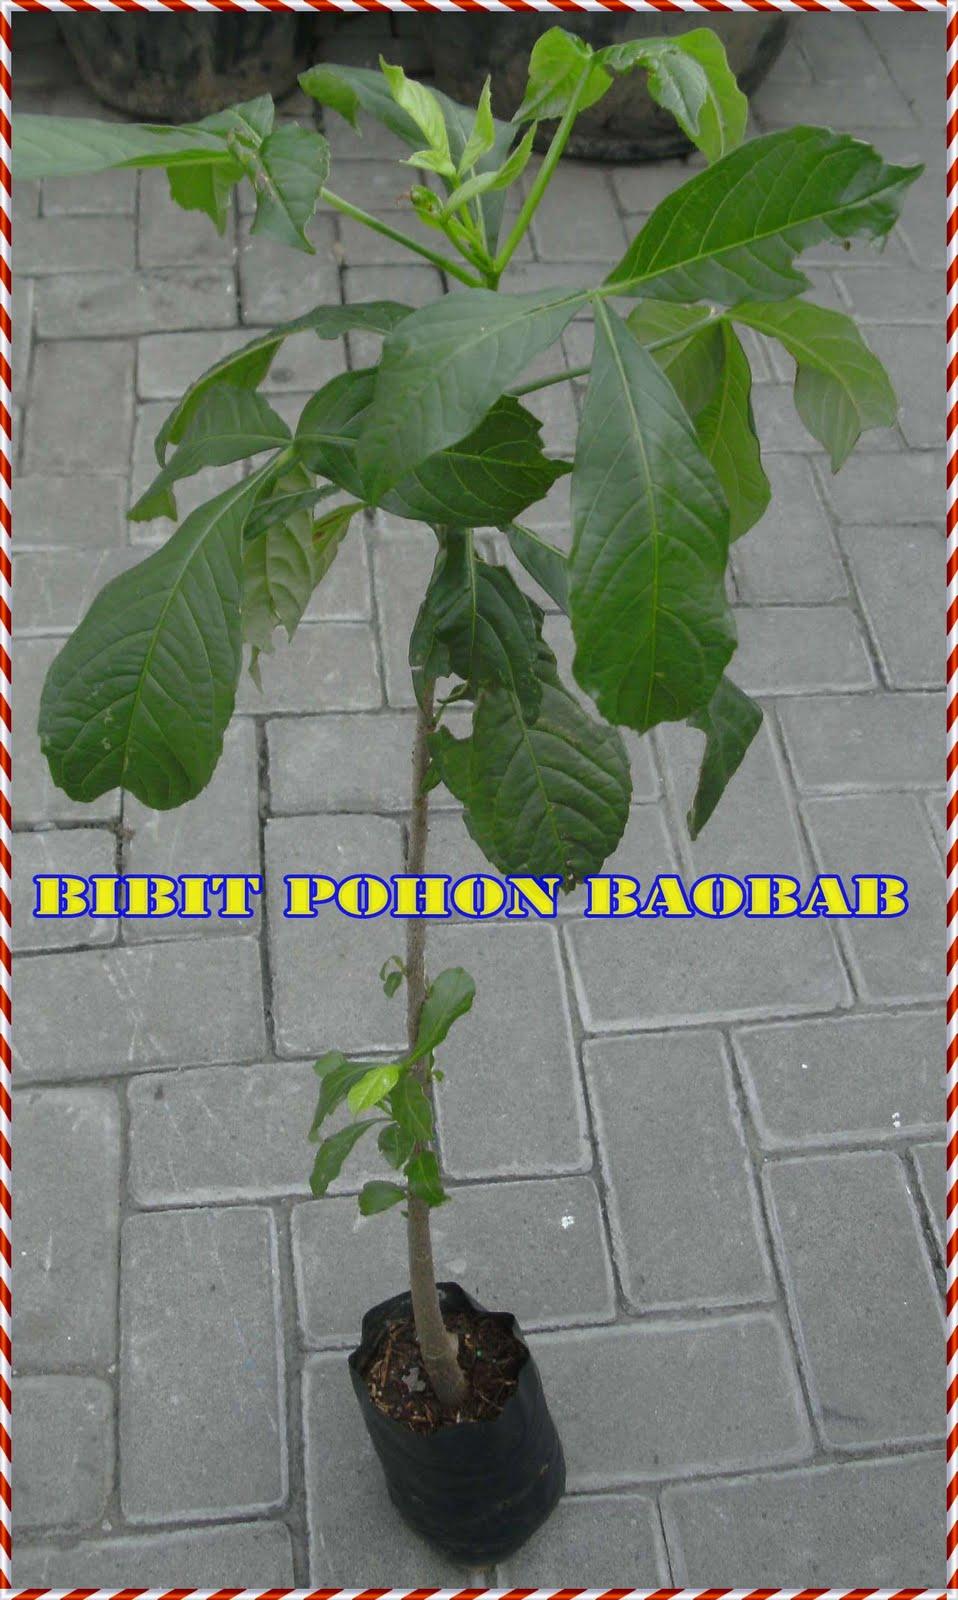 Ternyata pohon baobab african / asem buto terdapat segudang kasiat